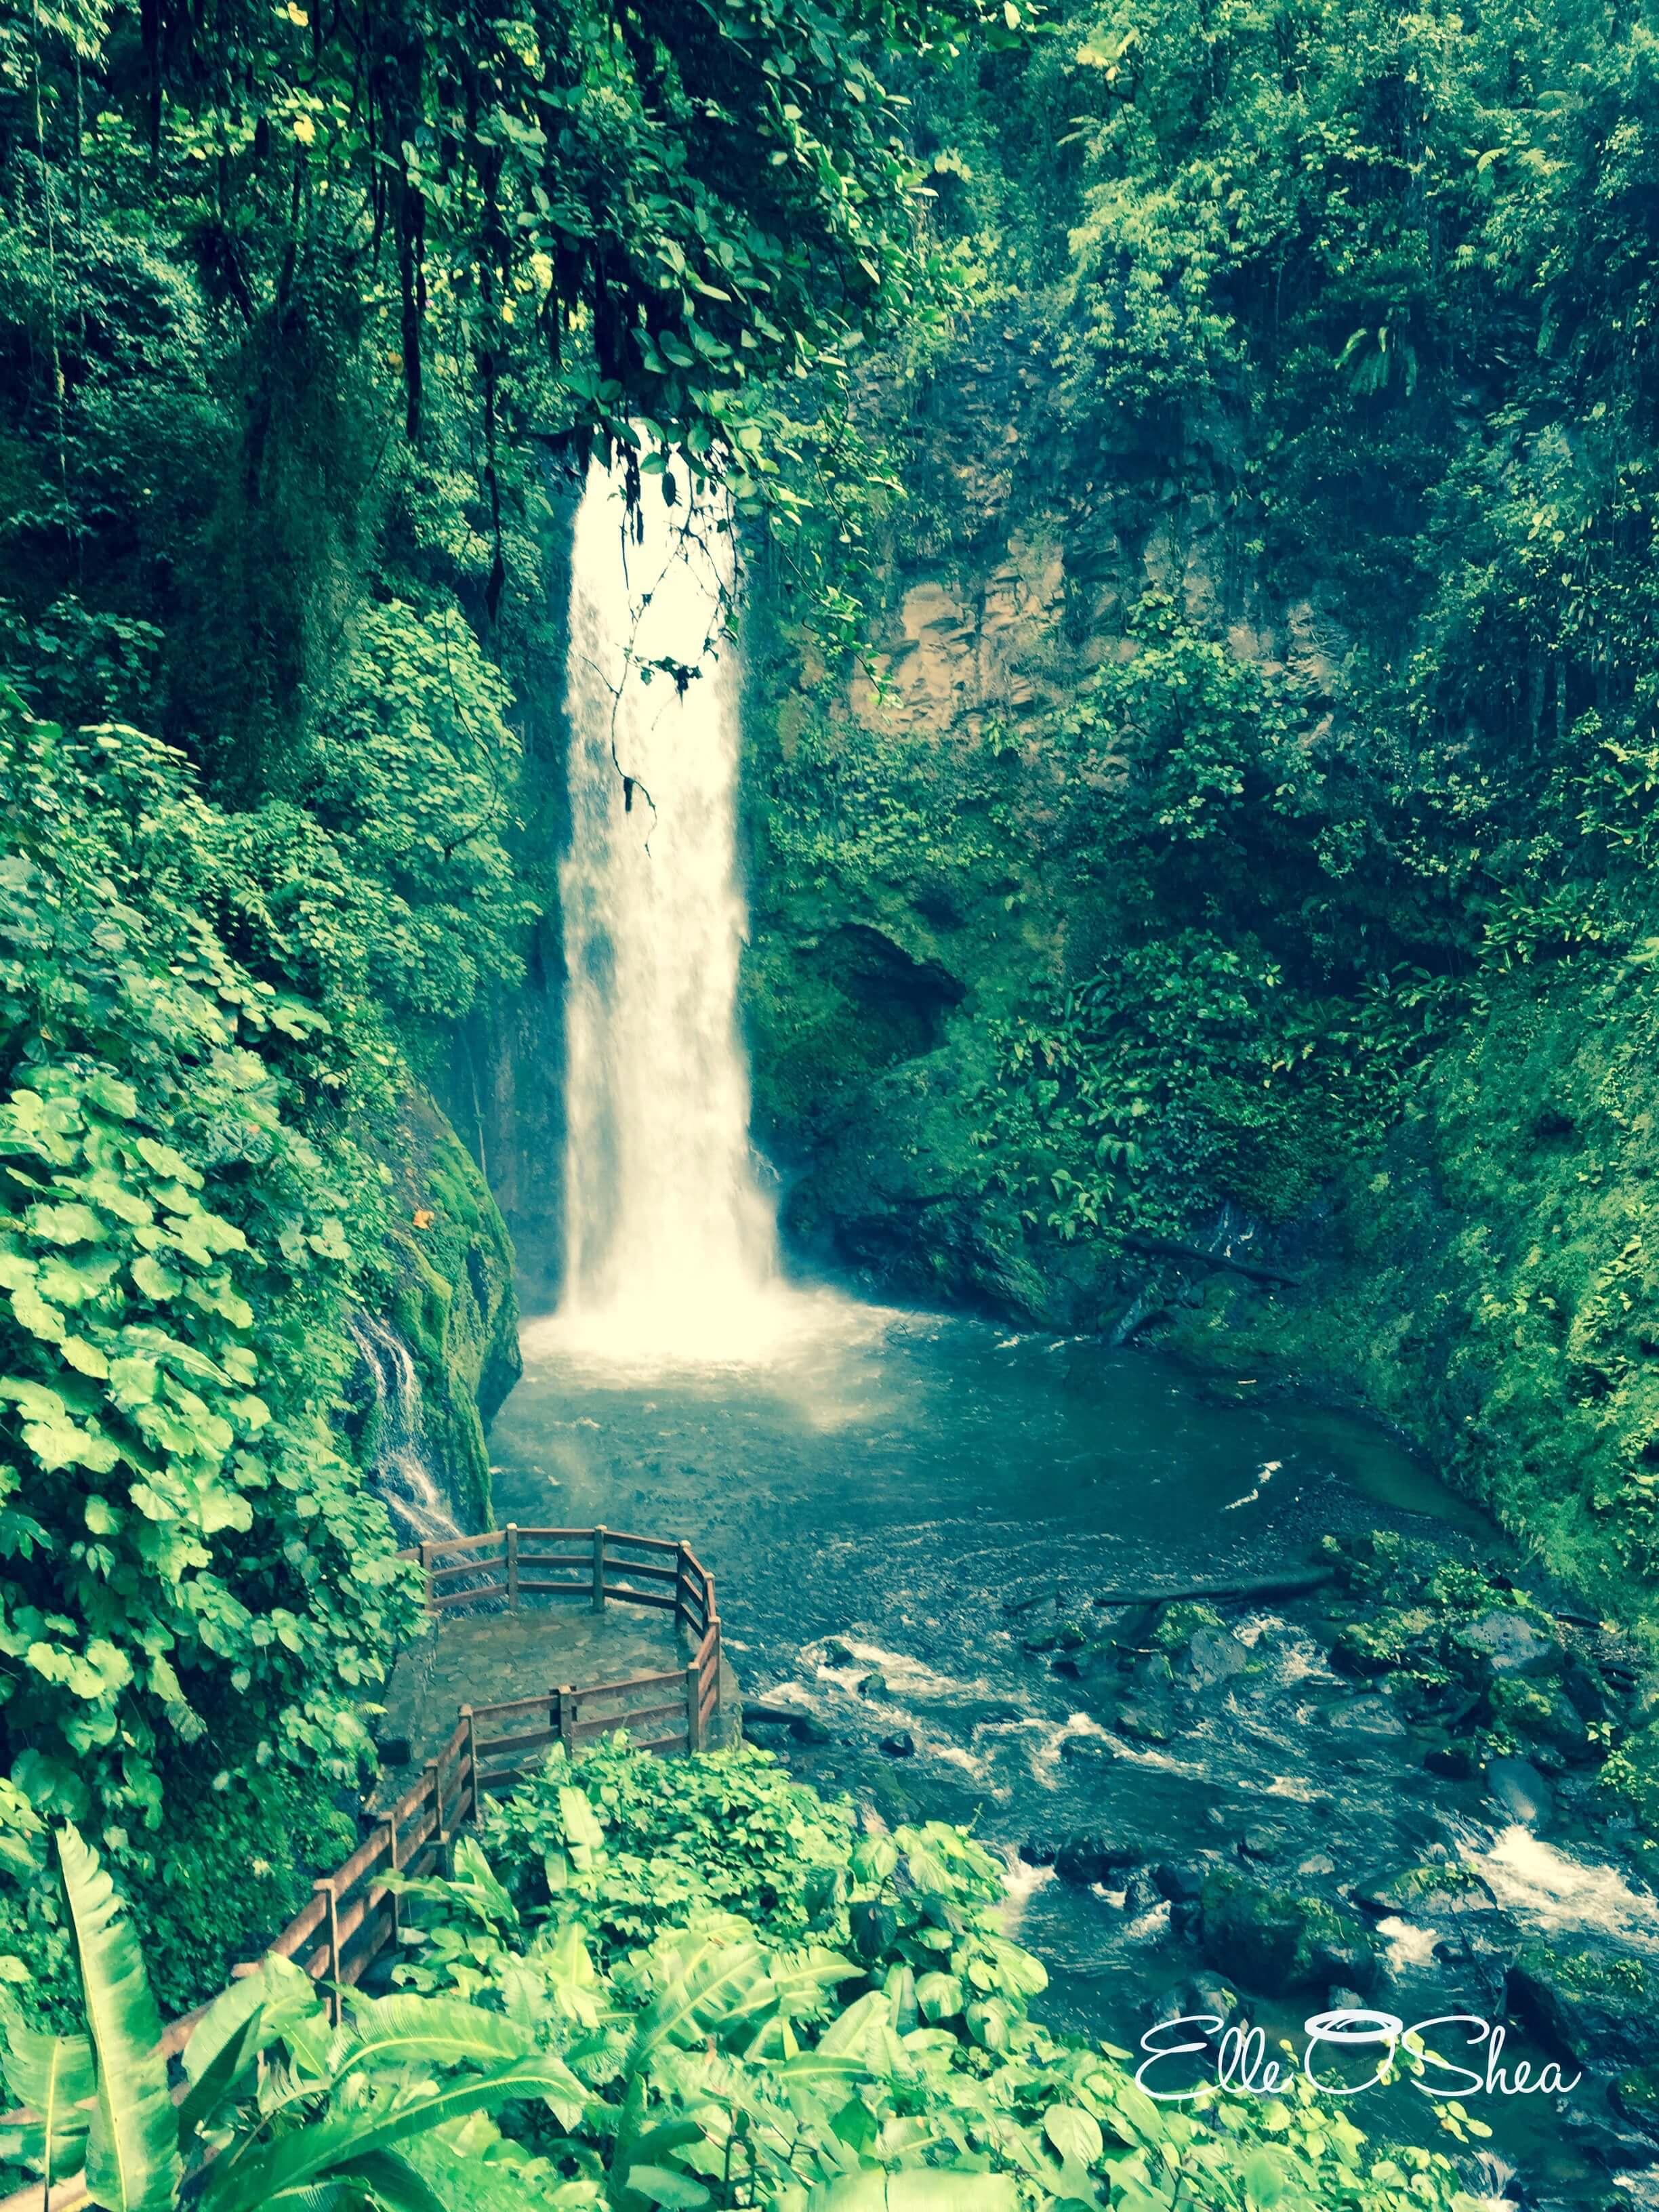 COSTA RICA-1 BY ELLE O'SHEA